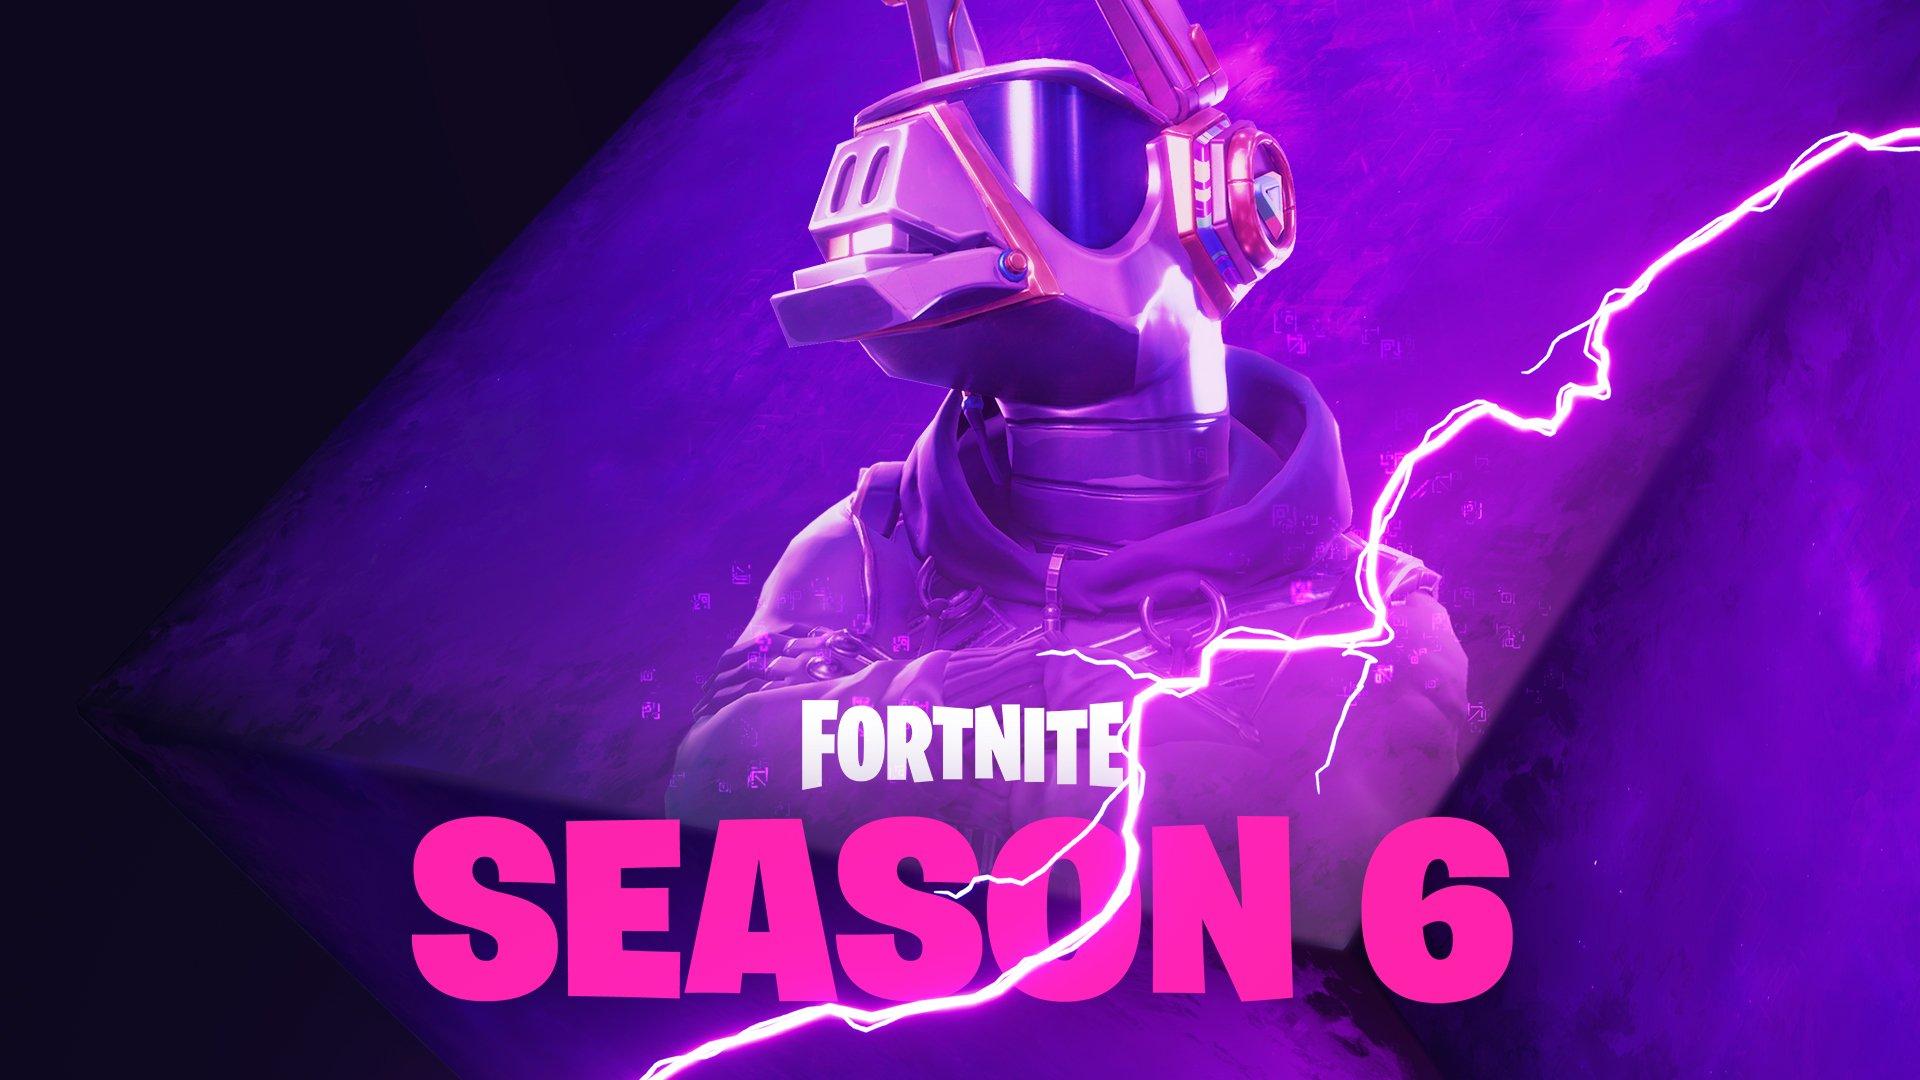 Fortnite Season 6 Teaser 1 - Loot Llama DJ